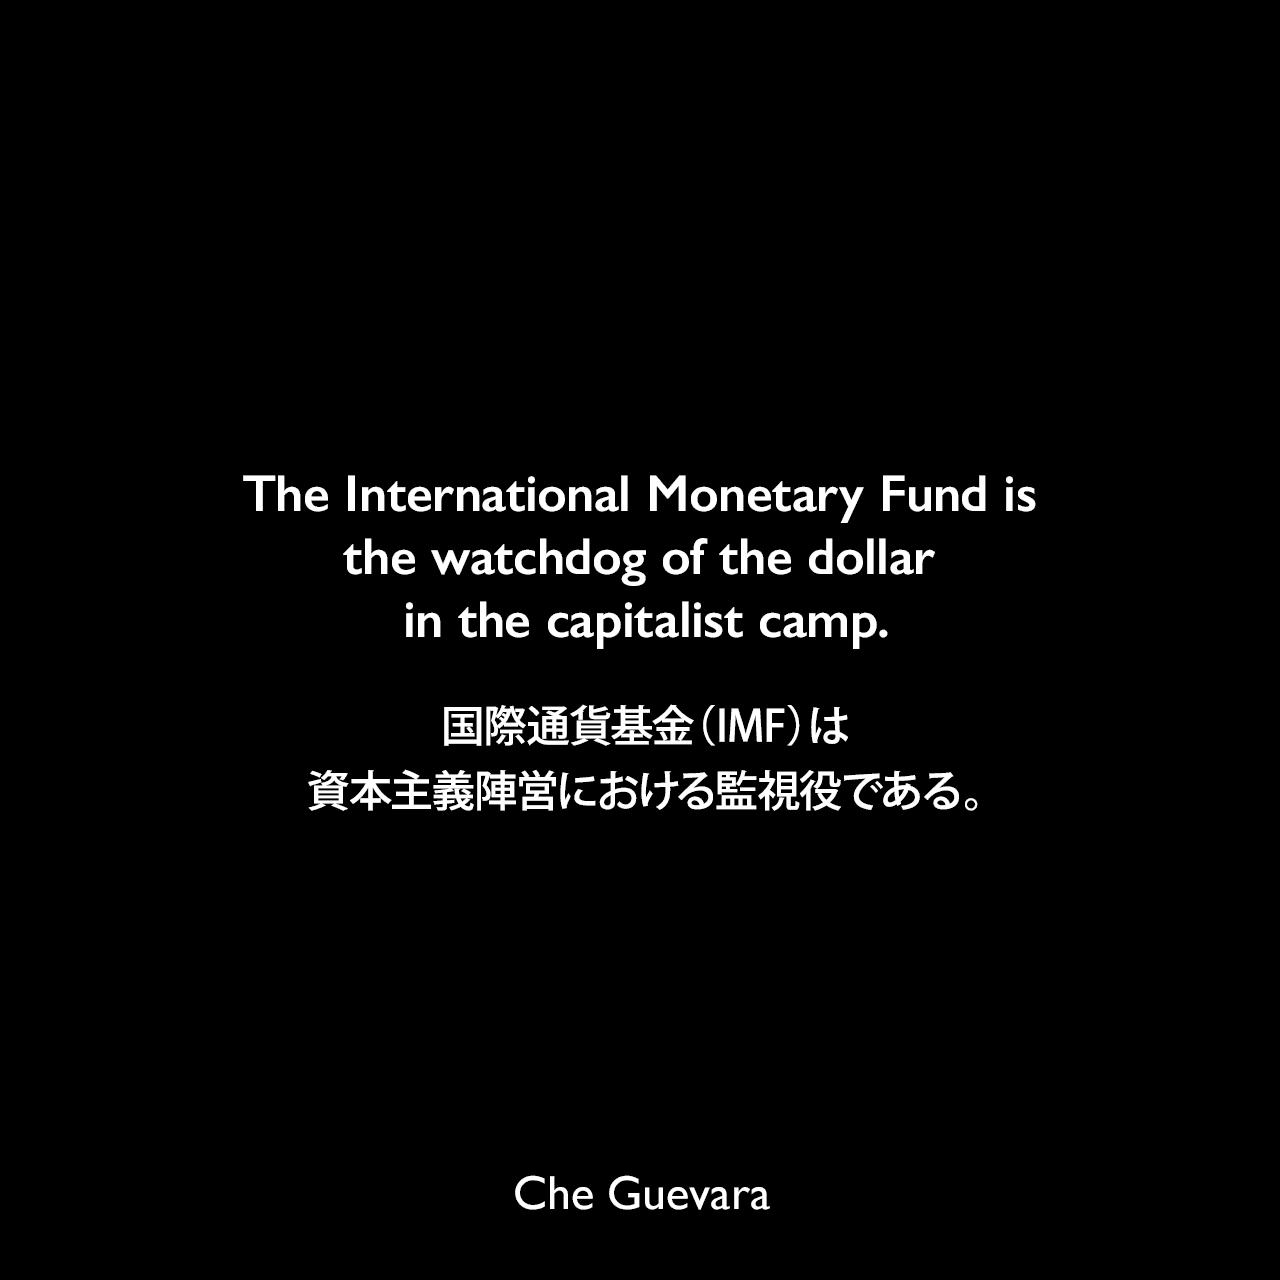 The International Monetary Fund is the watchdog of the dollar in the capitalist camp.国際通貨基金(IMF)は、資本主義陣営における監視役である。- 1964年3月25日ジュネーブでの国連会議で発表されたスピーチChe Guevara